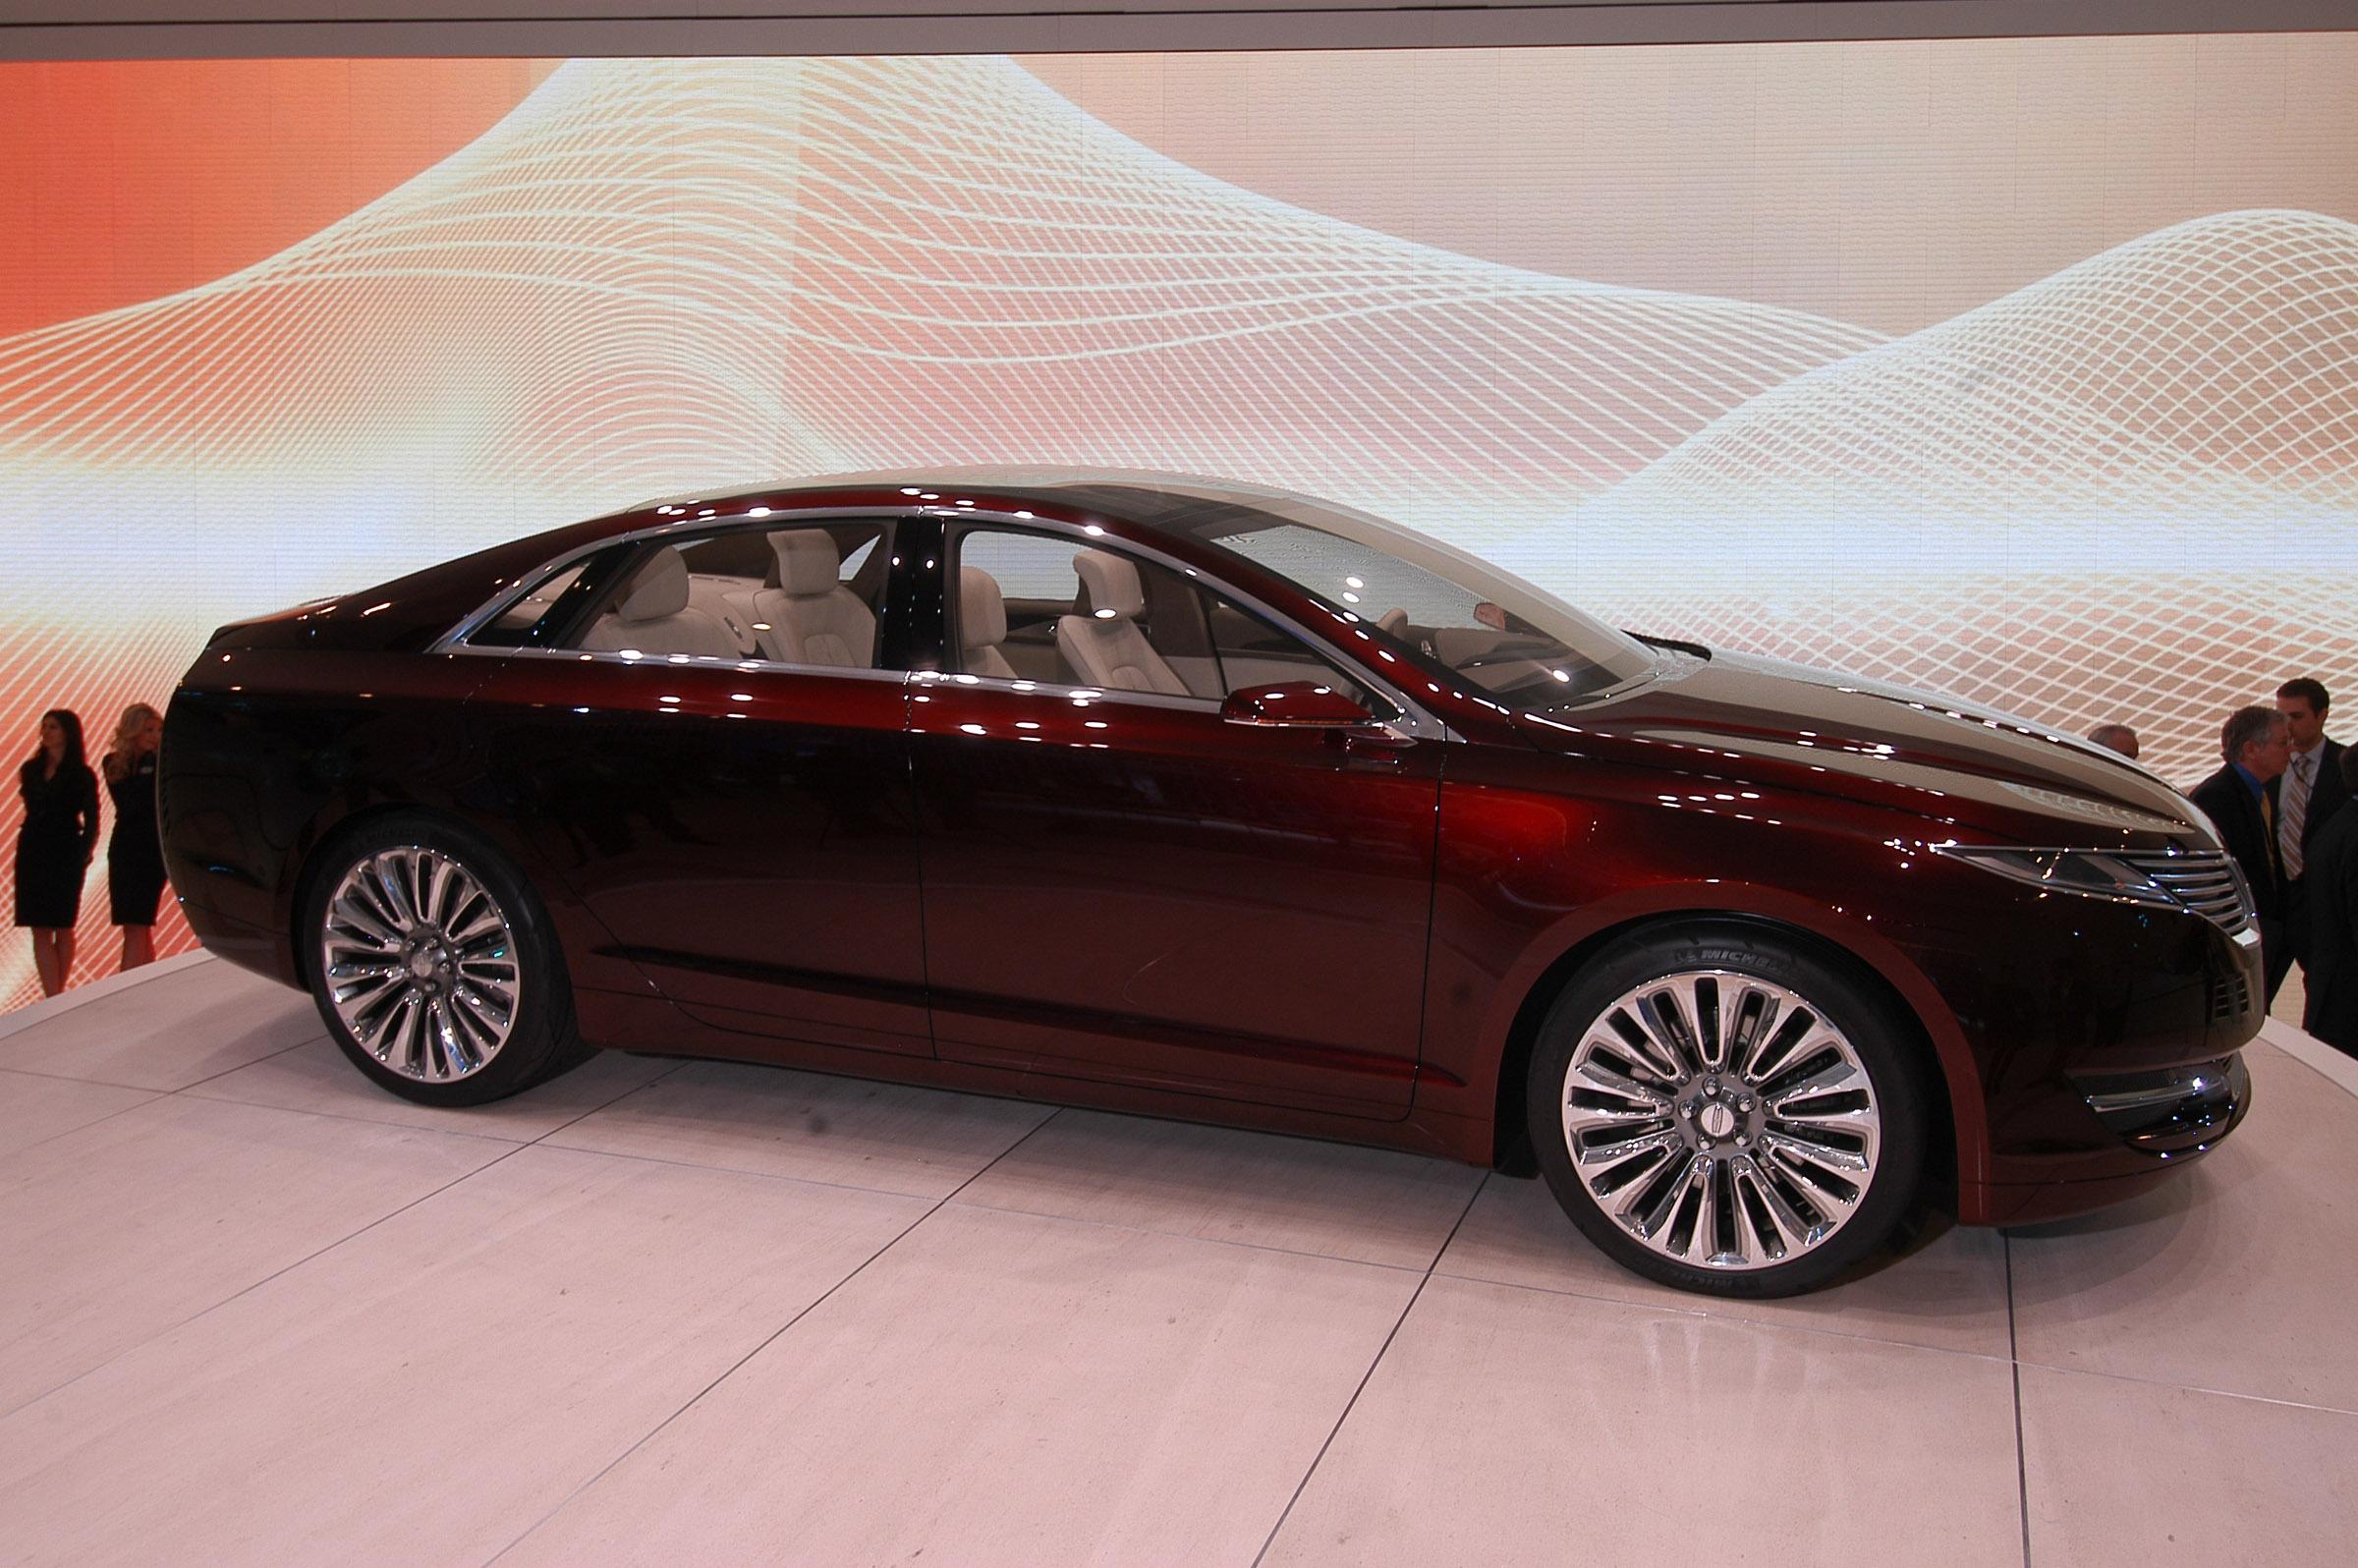 https://www.automobilesreview.com/gallery/lincoln-mkz-concept-detroit-2012/lincoln-mkz-concept-detroit-2012-05.jpg